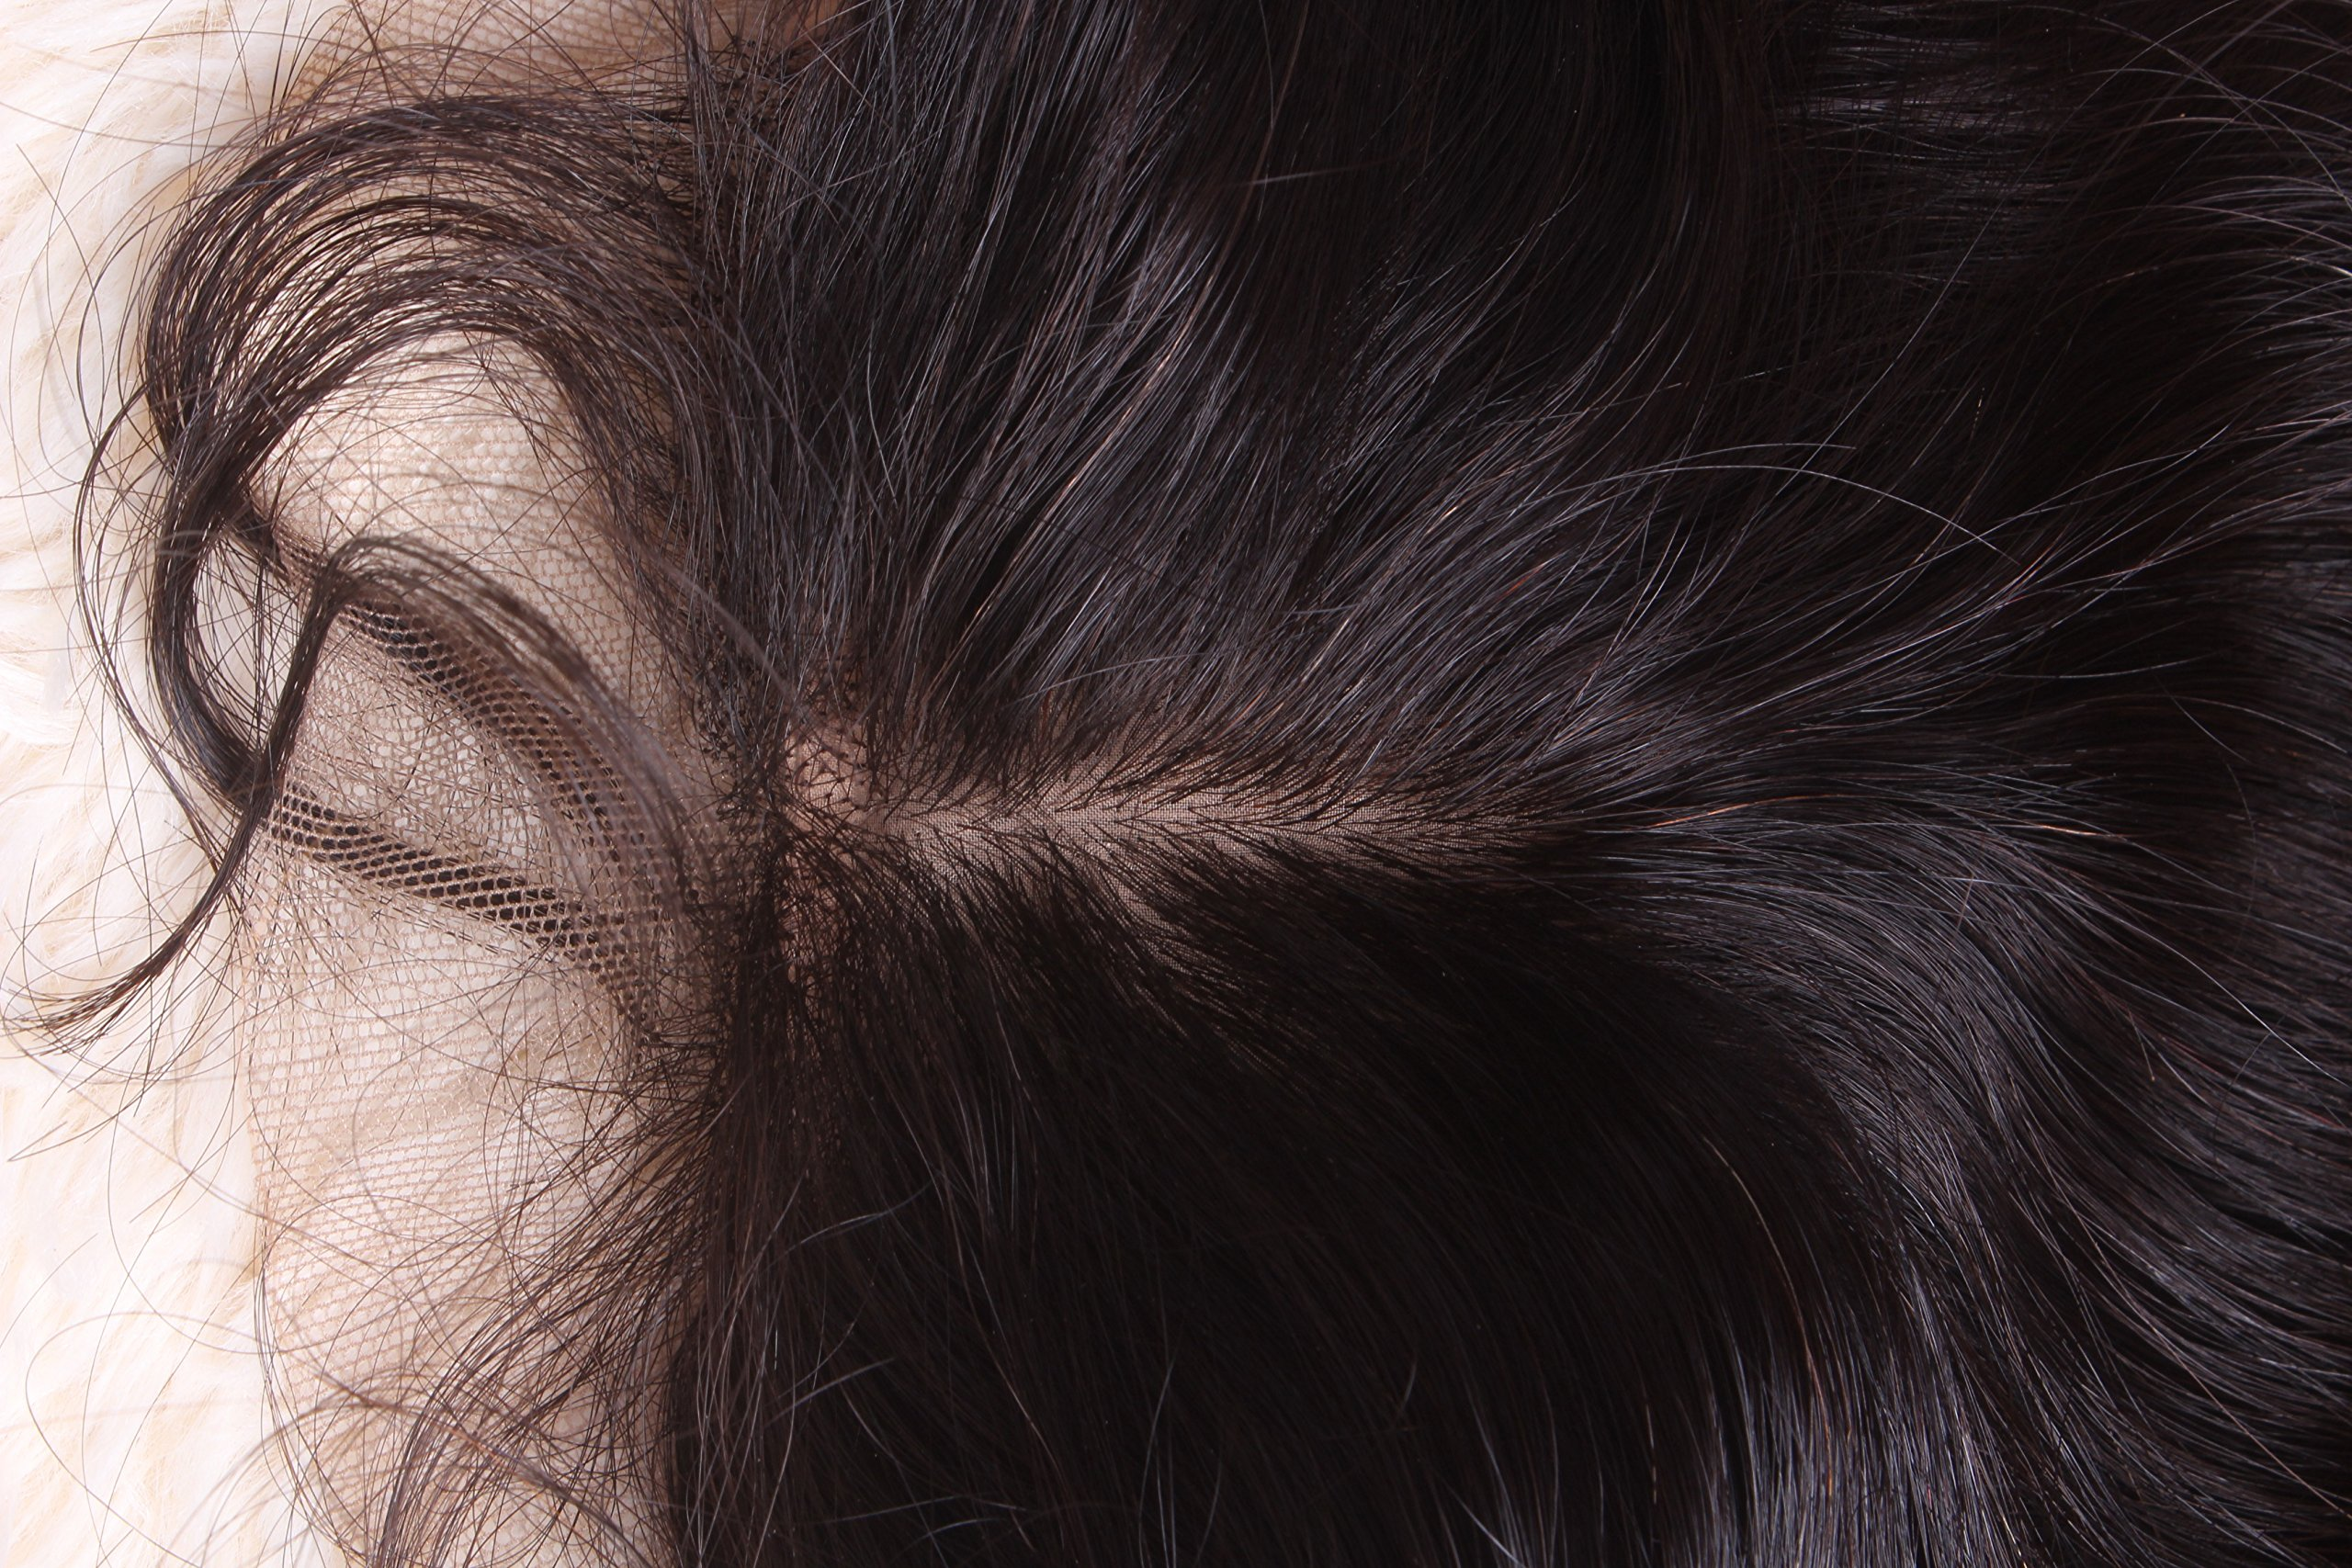 Silk Base Closure - Malaysian Straight Hair - 6a Grade - 4x4, 20 Inches, Freestyle Part by Nubian Crown Hair